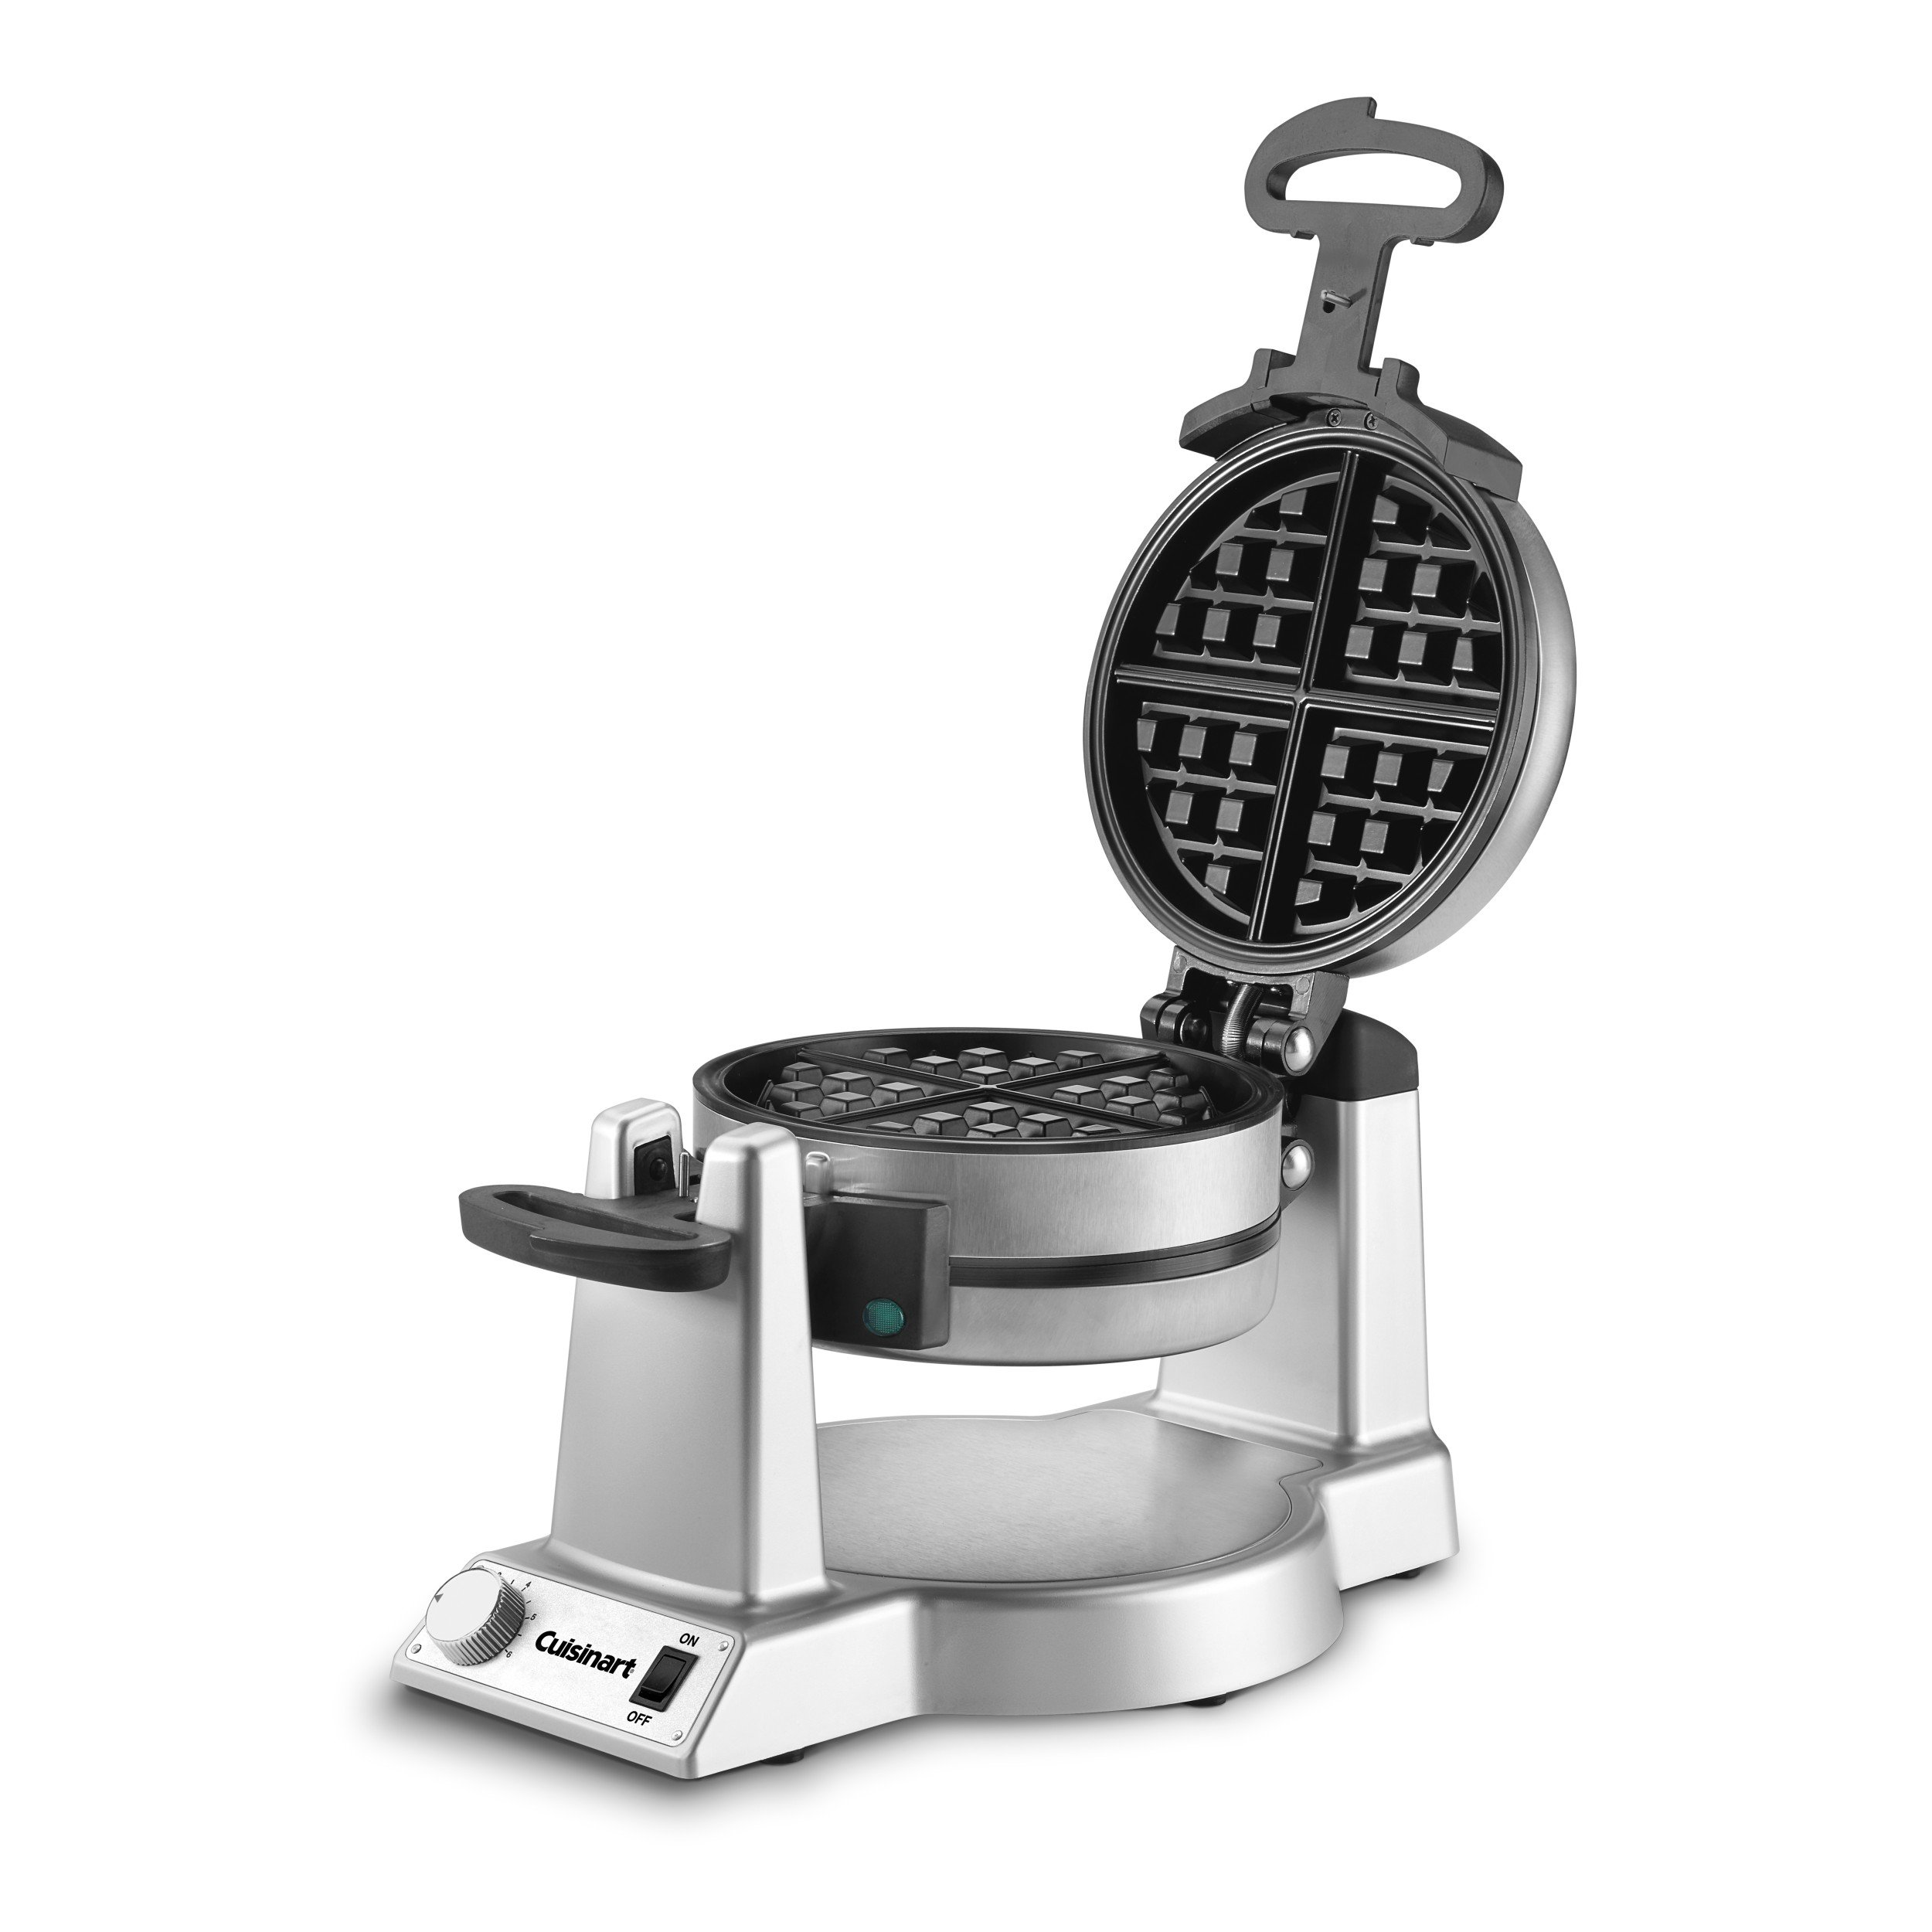 Cuisinart WAF-F20 Double Belgian Waffle Maker, Stainless Steel by Cuisinart